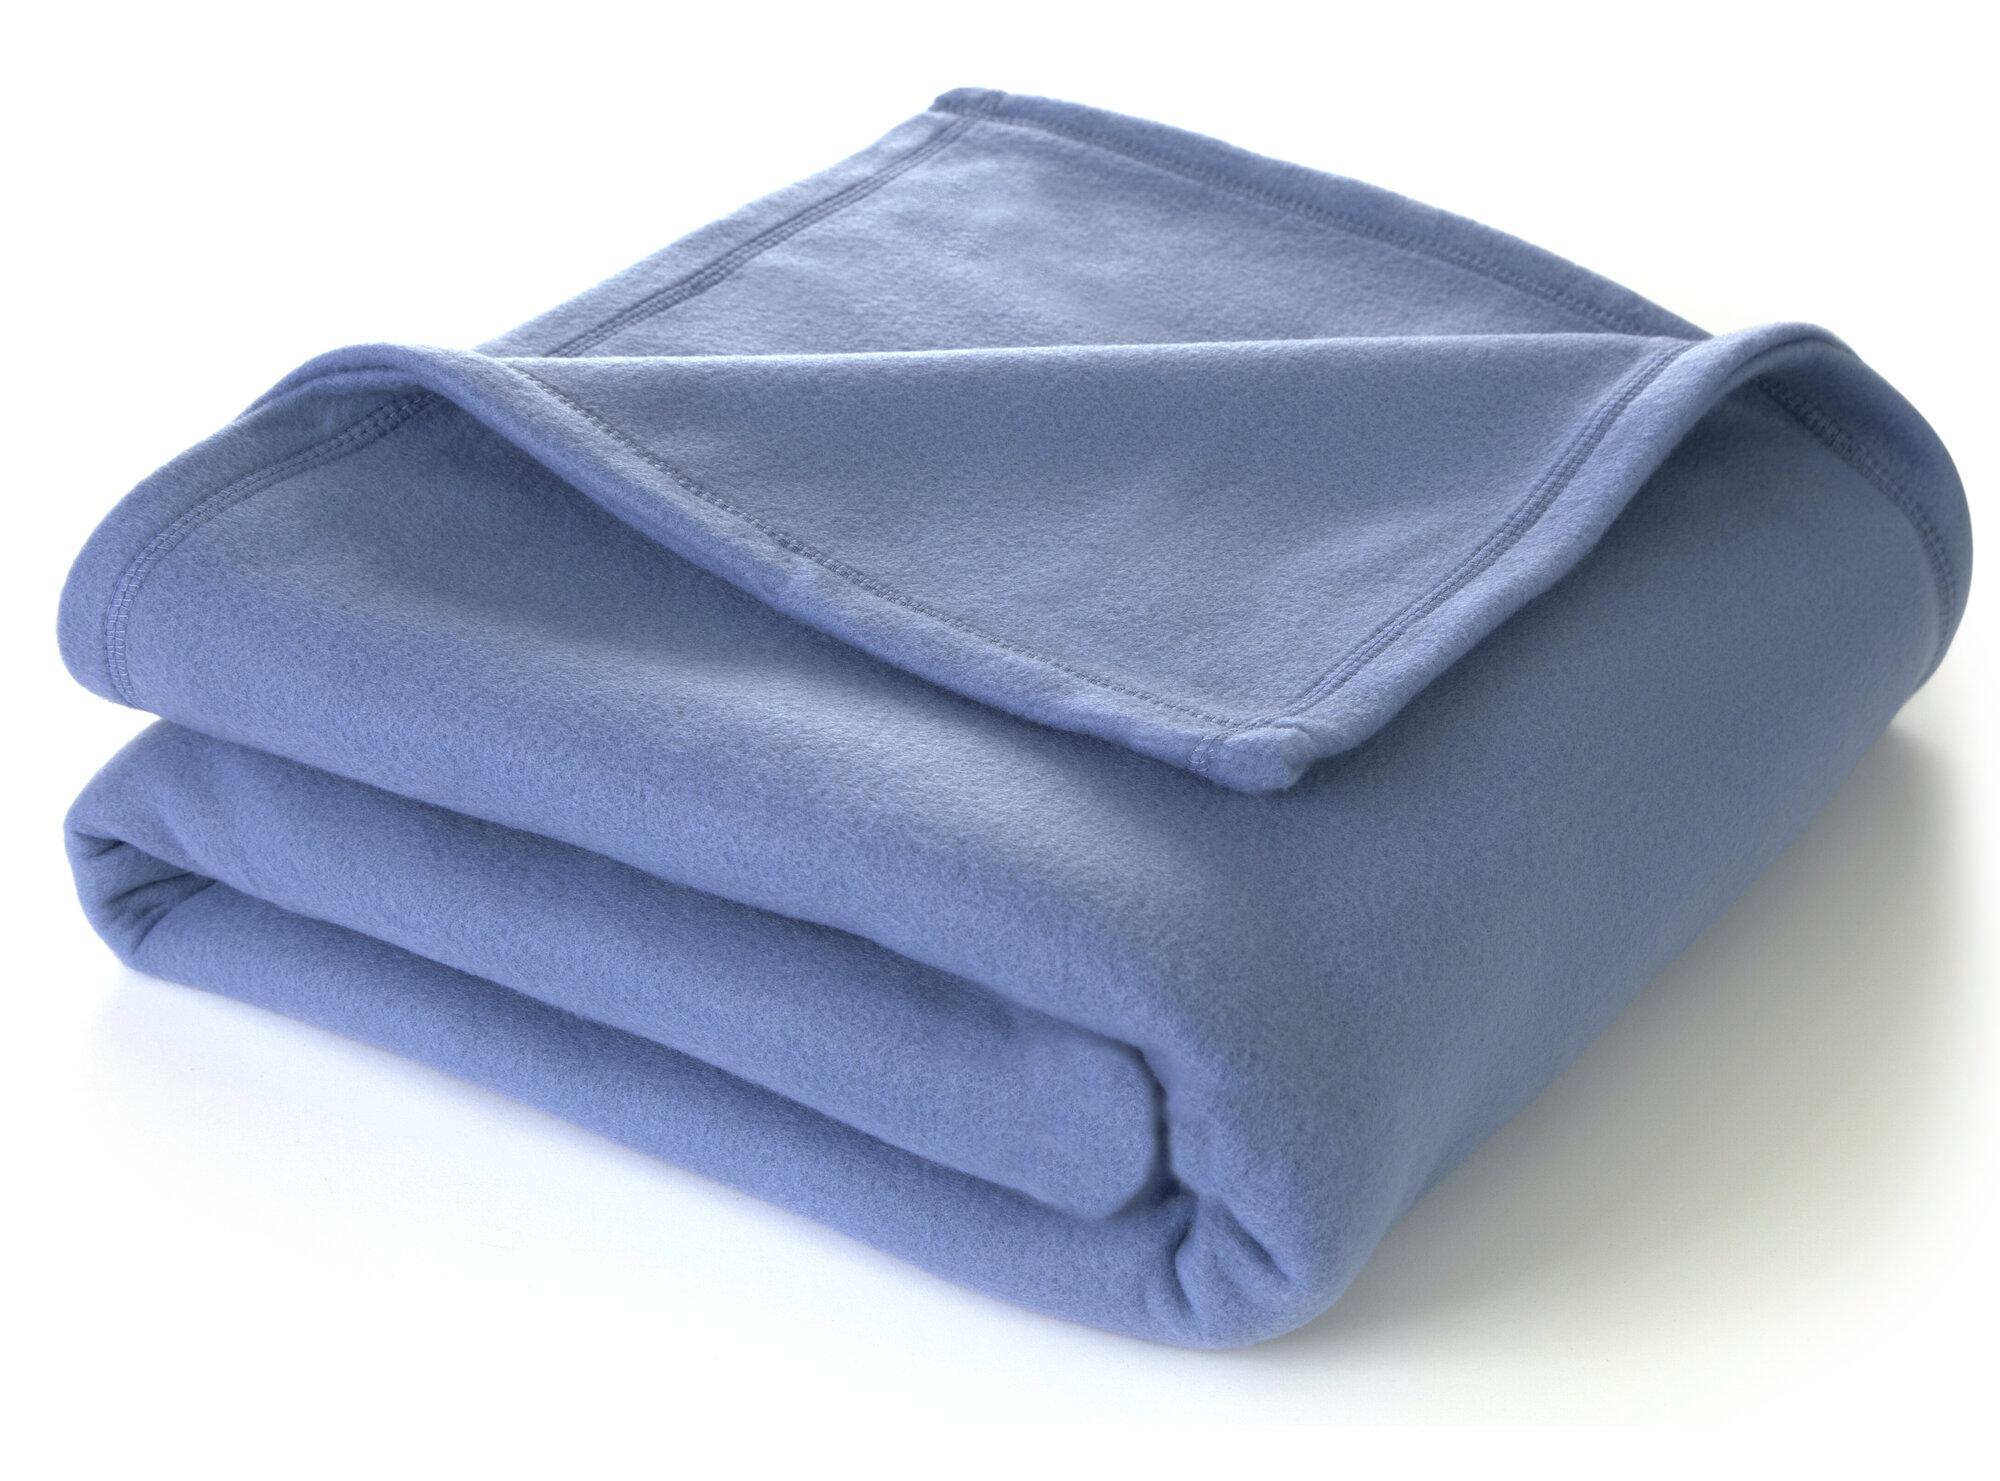 Vellux martex super soft polyester fleece throw blanket ebay for Vellux blanket